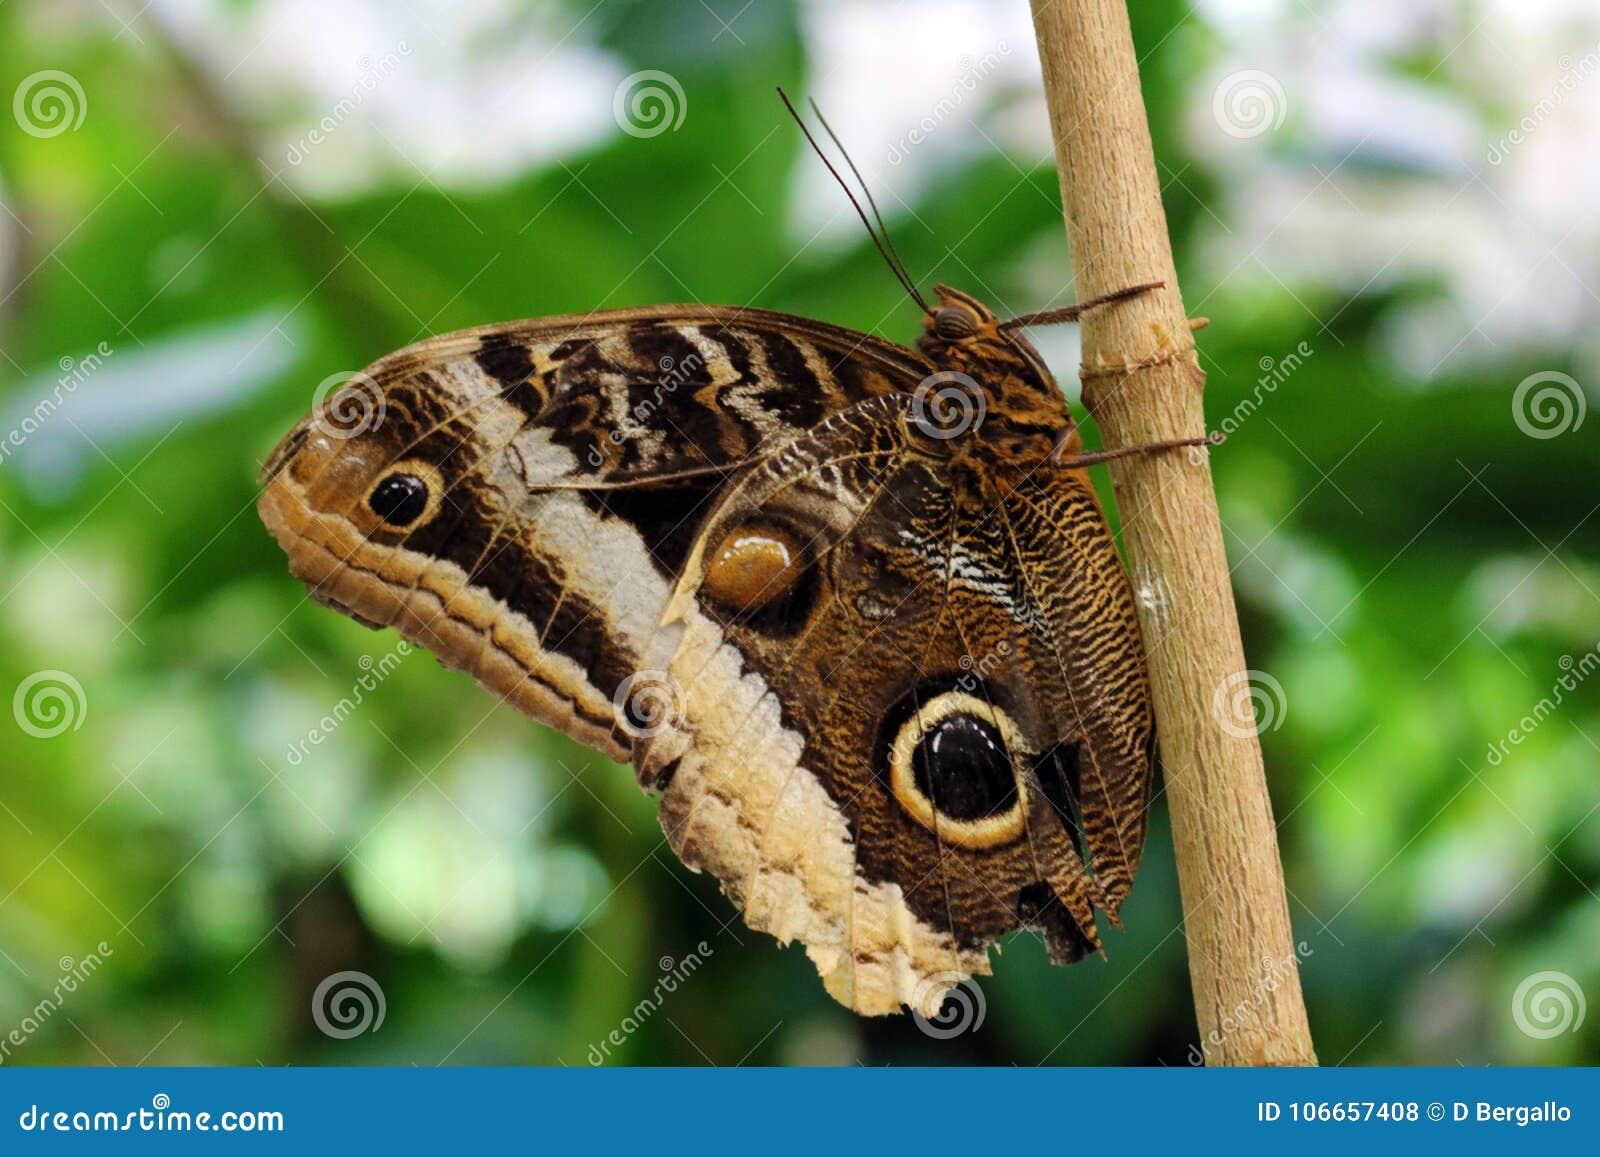 The Owl Butterfly in Costa Rica mariposa naranja